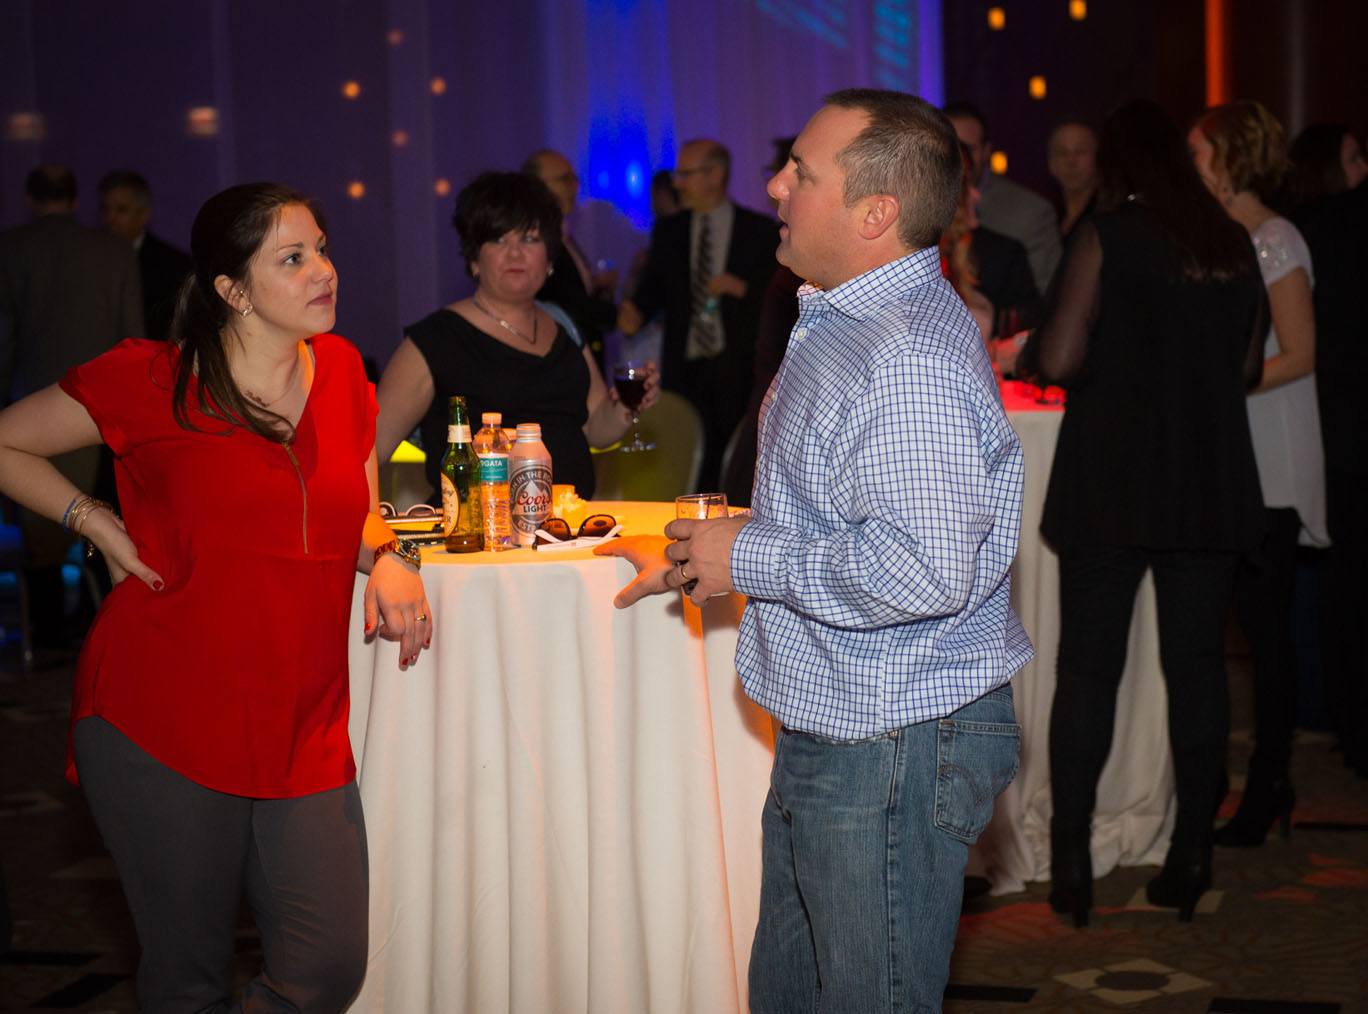 2015-12-09 ReMax Corpoarte Event - The Borgata - Atlantic City NJ - Photo Sesh - 2015-5206.jpg